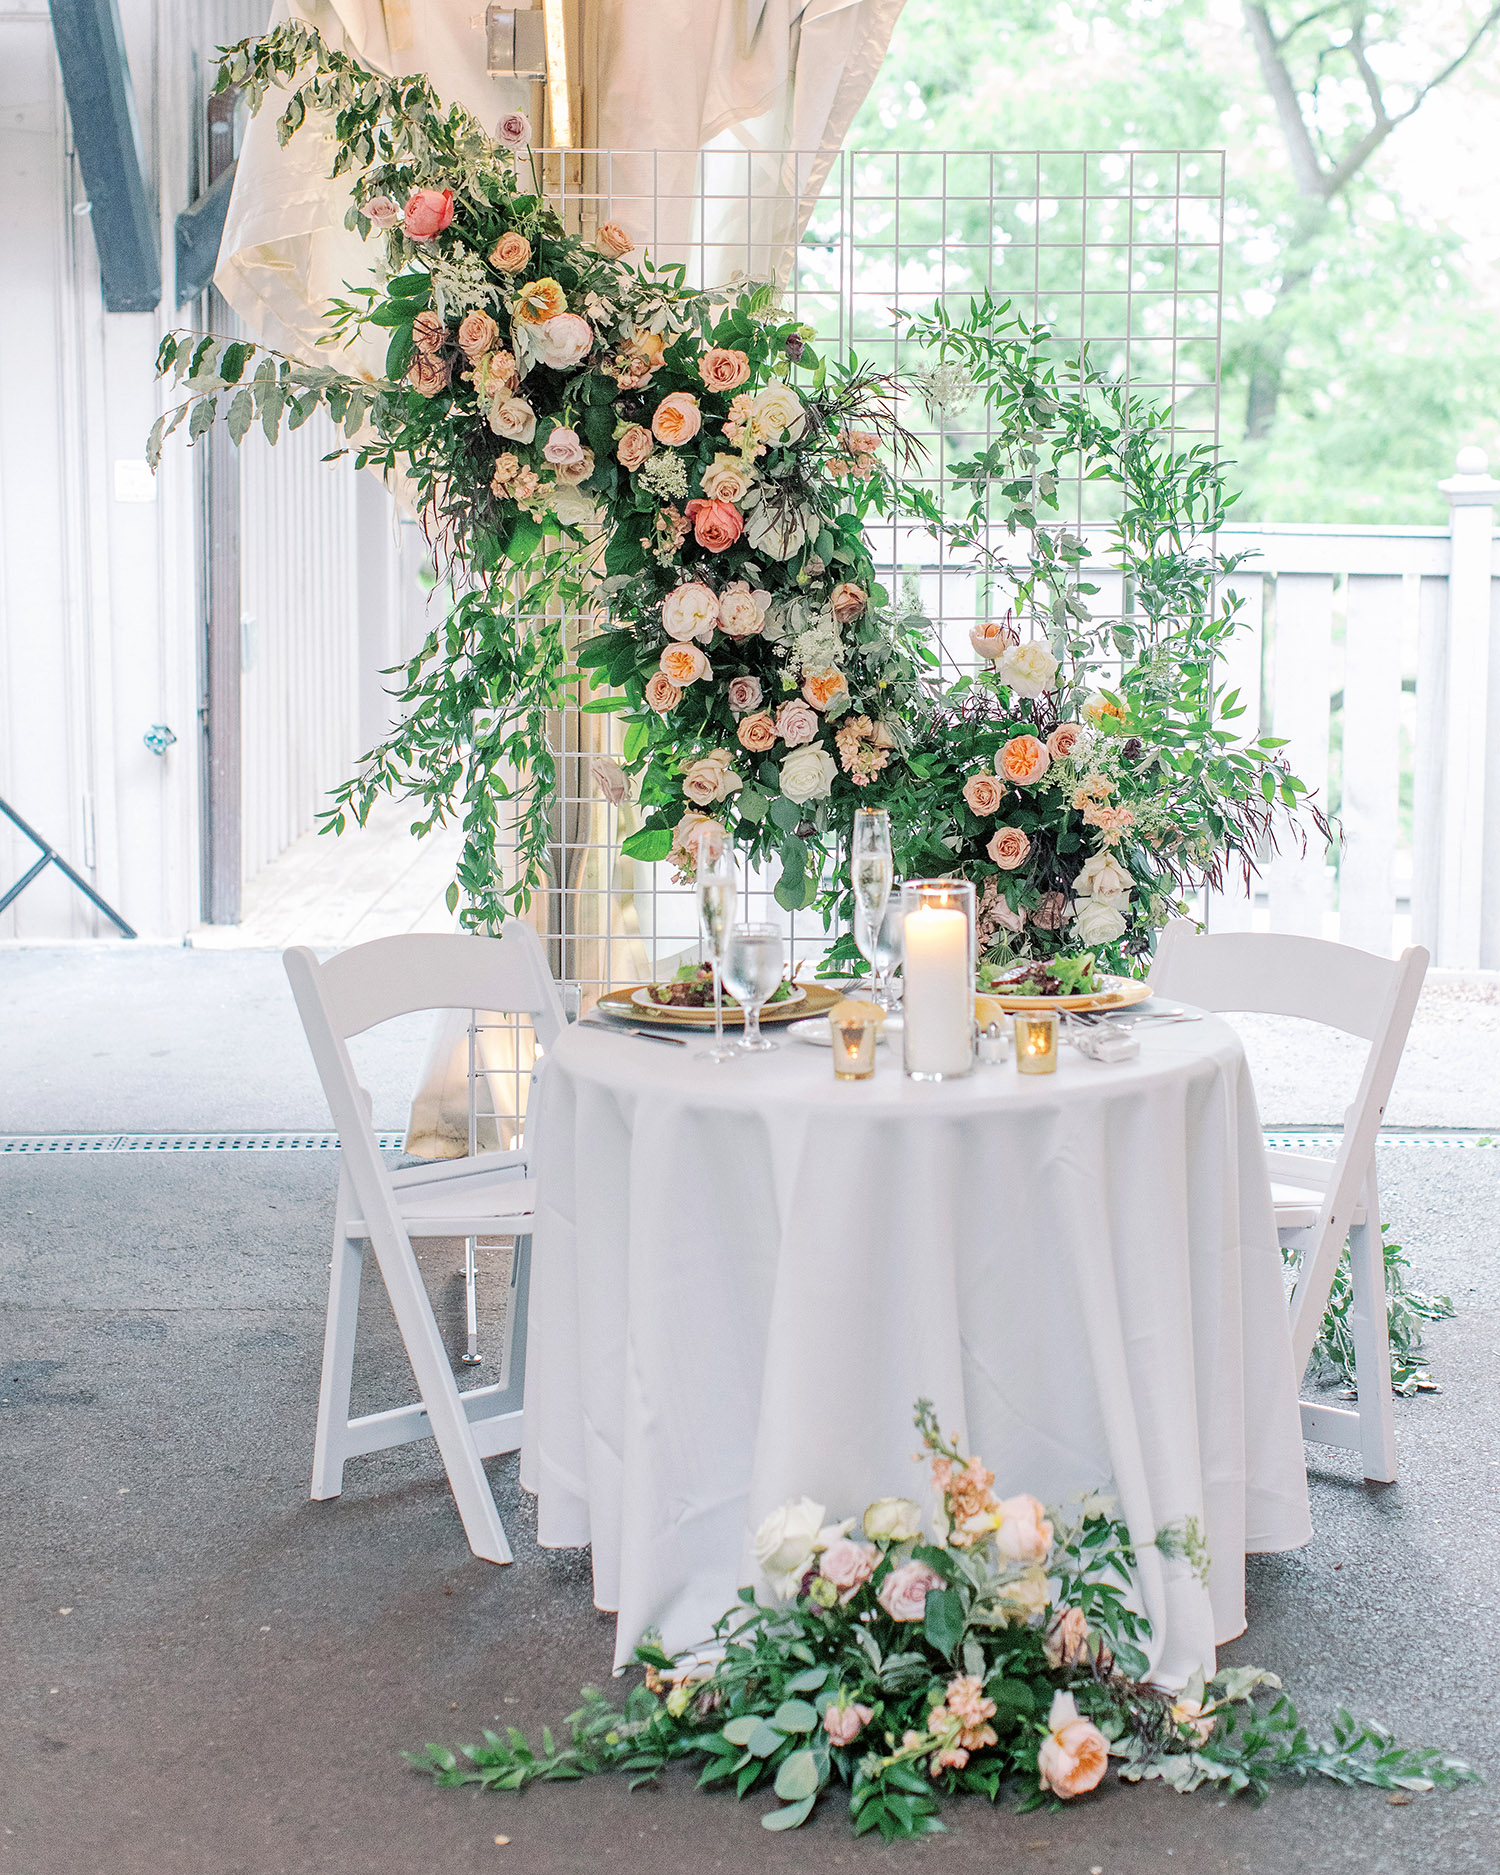 noel mike wedding reception sweetheart table